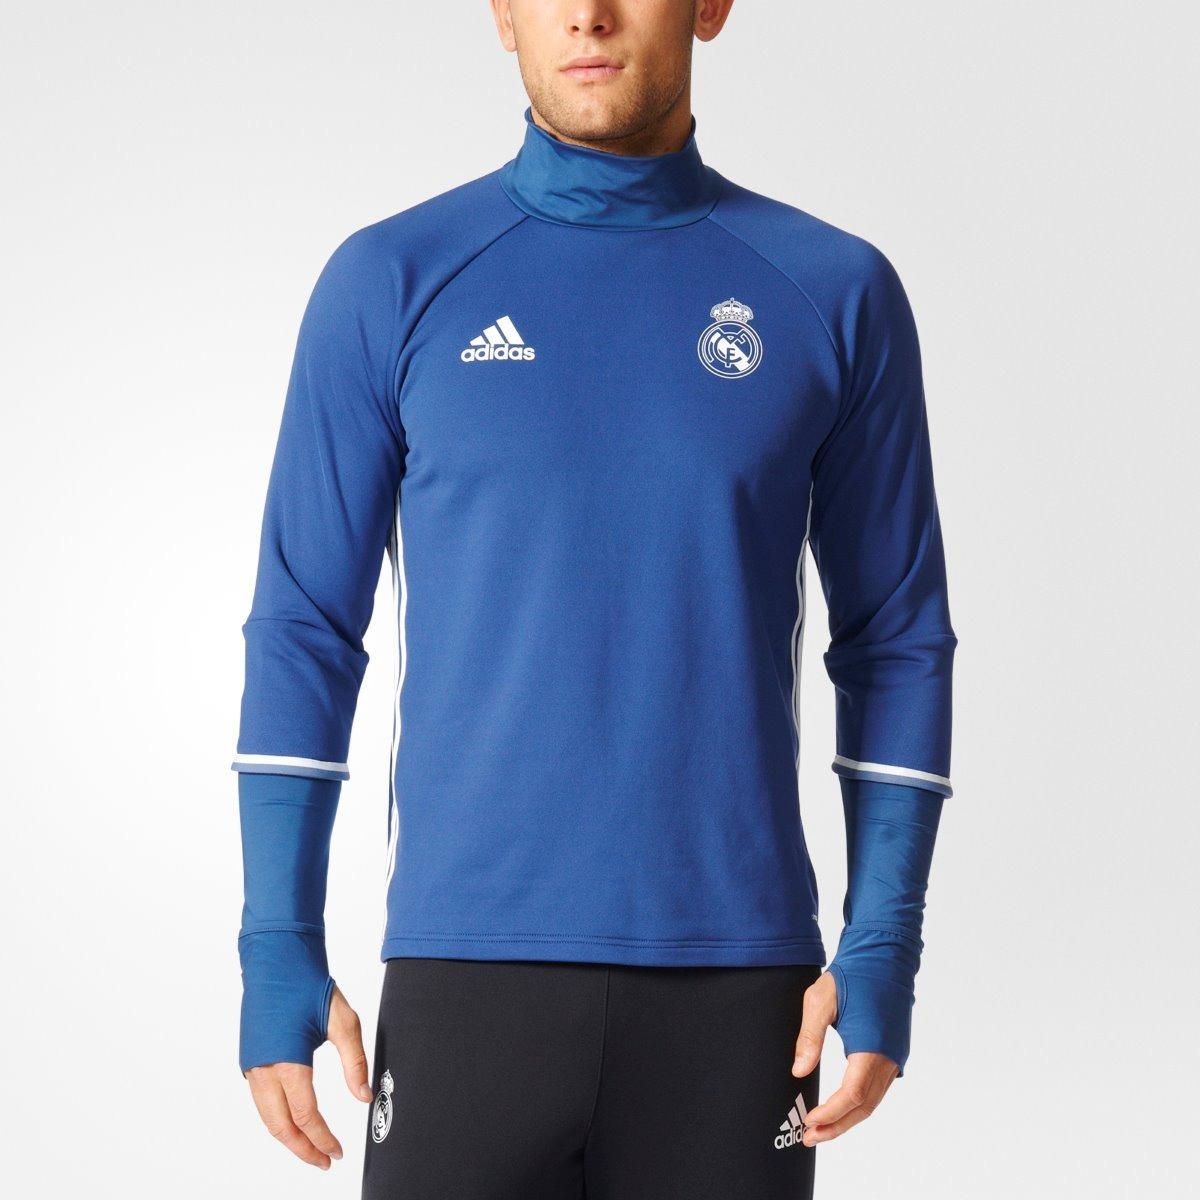 Madrid adidas Sudadera Entrenamiento Real rCQdthBsxo